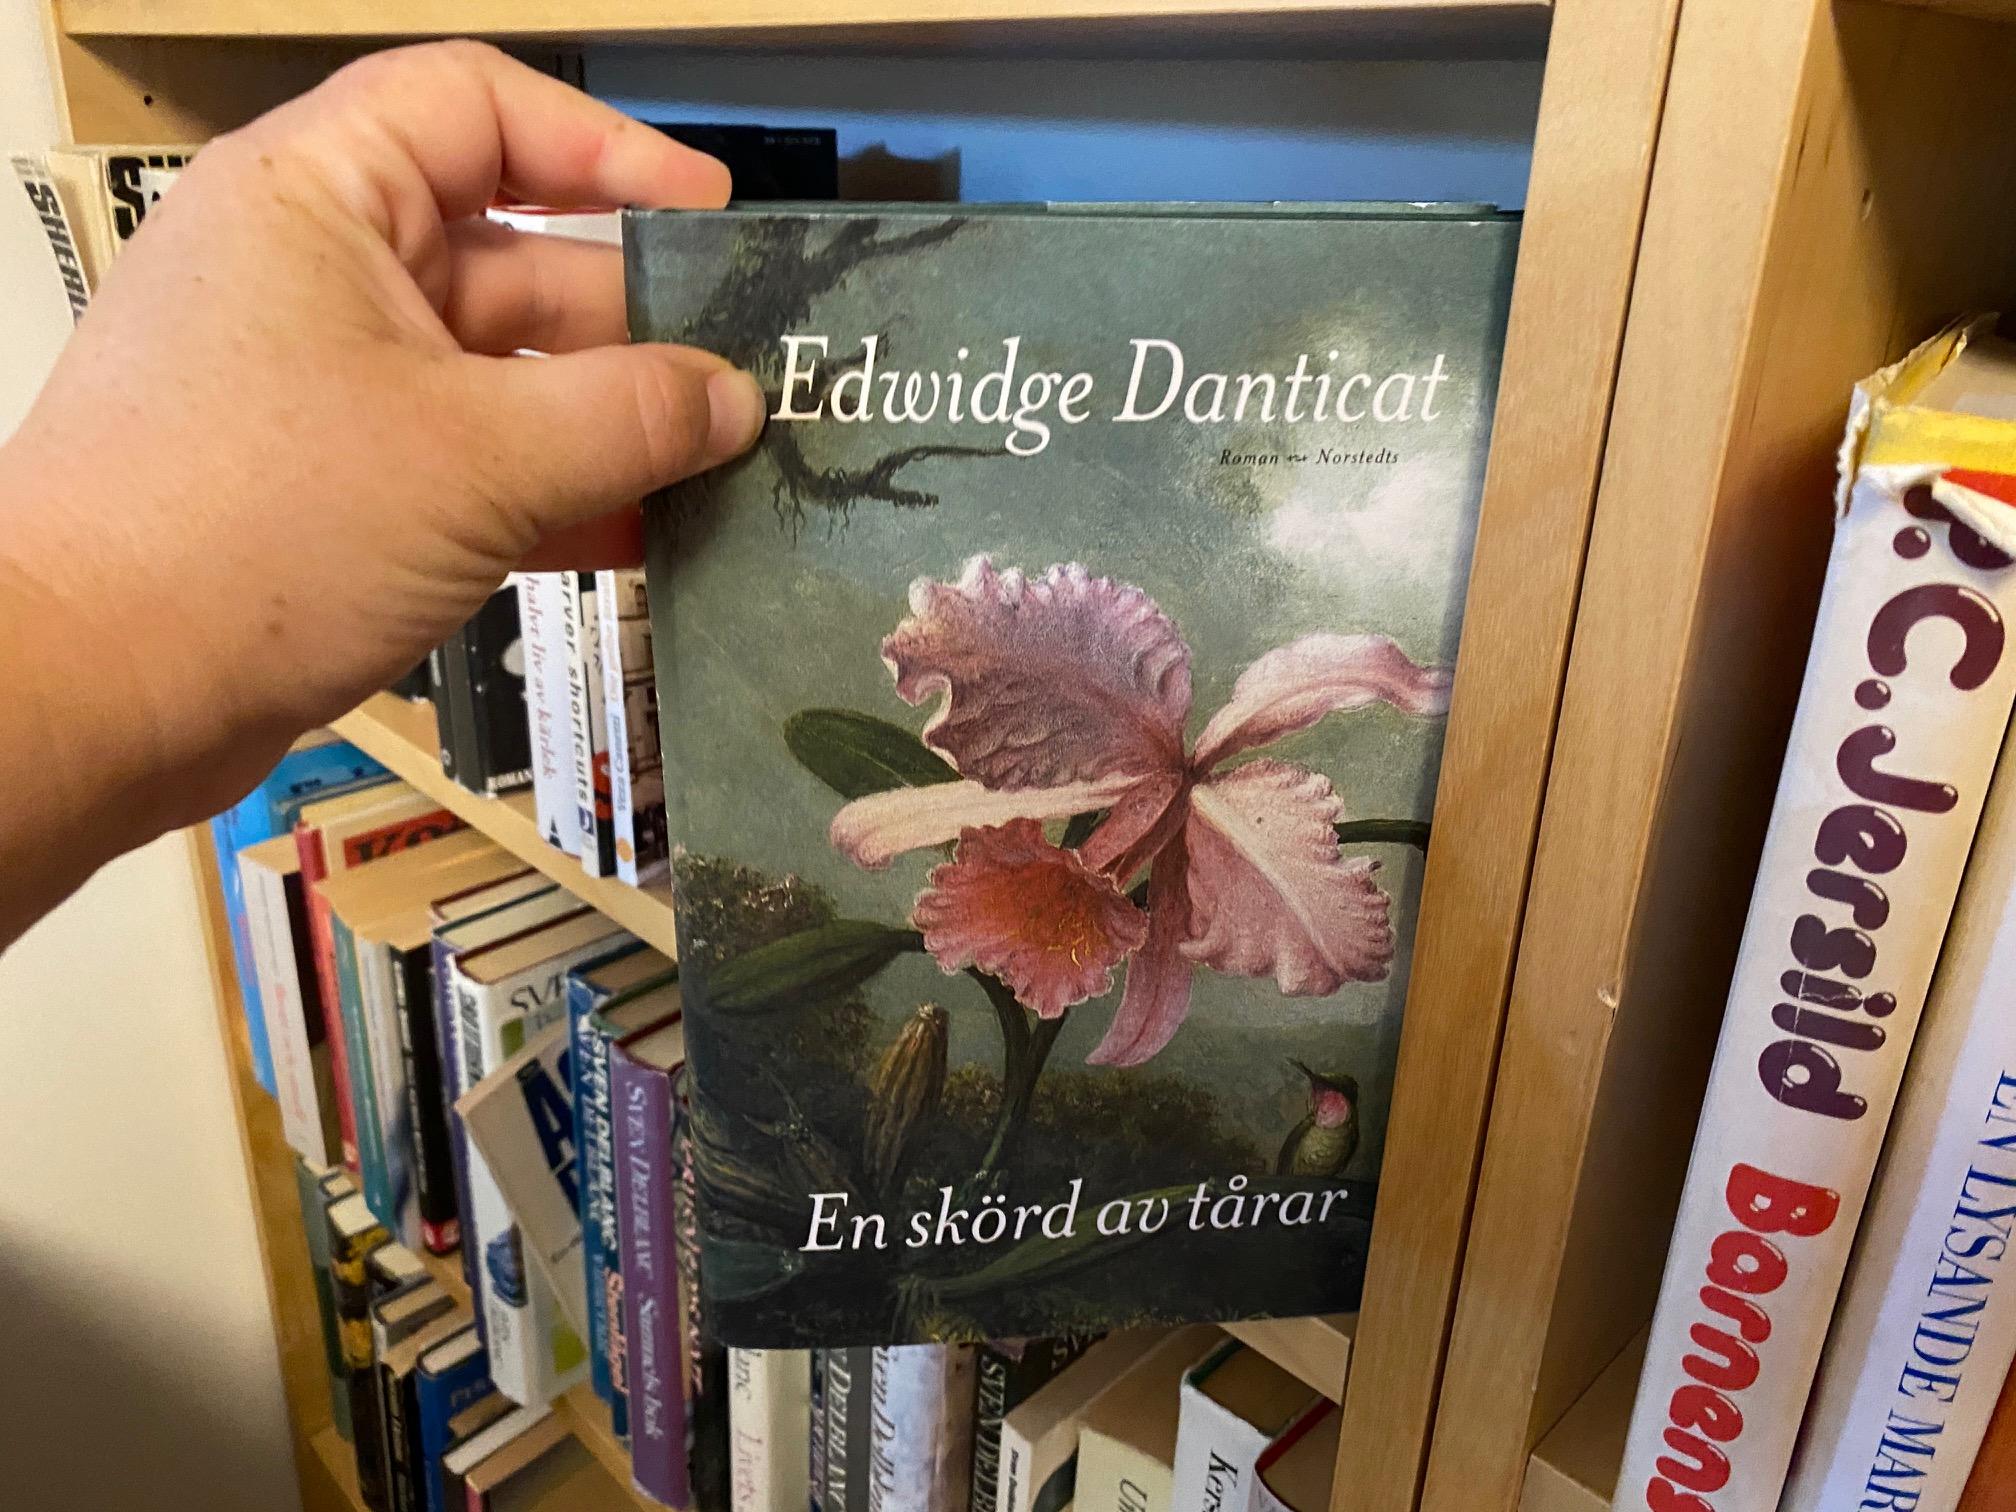 Edwidge Danticat i min bokhylla